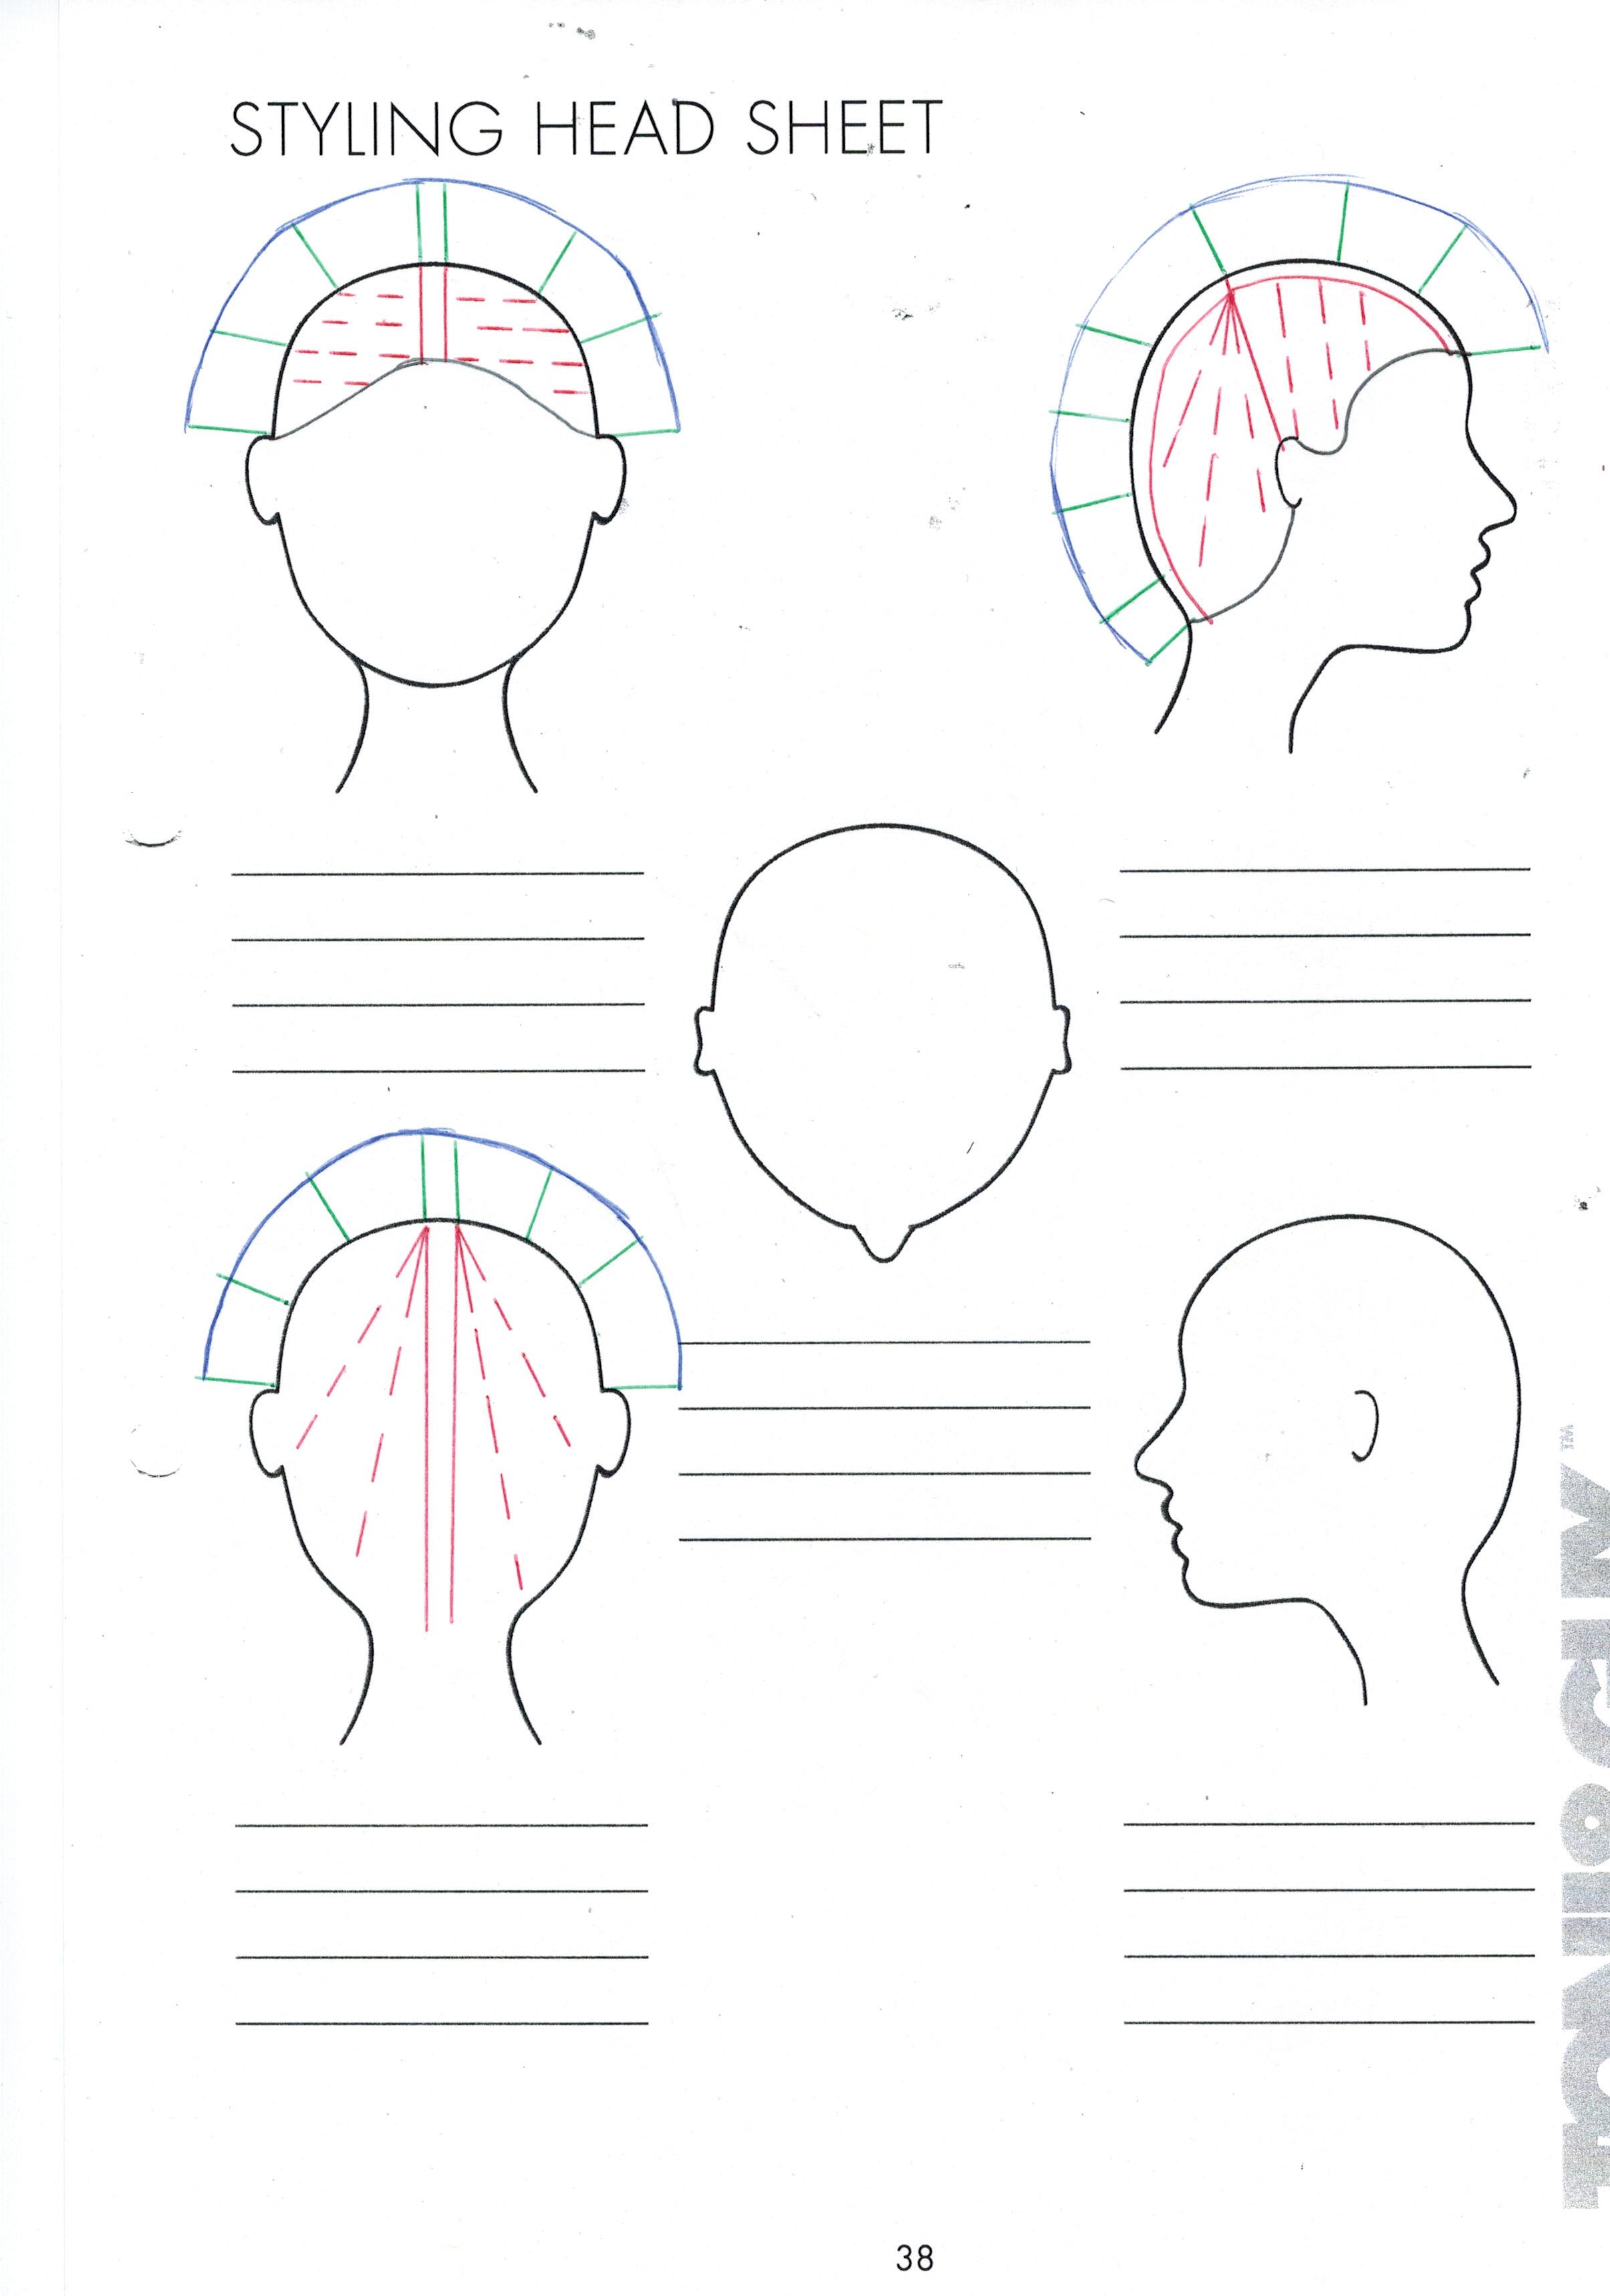 Cutting Hair Layers Horizontal Or Vertical